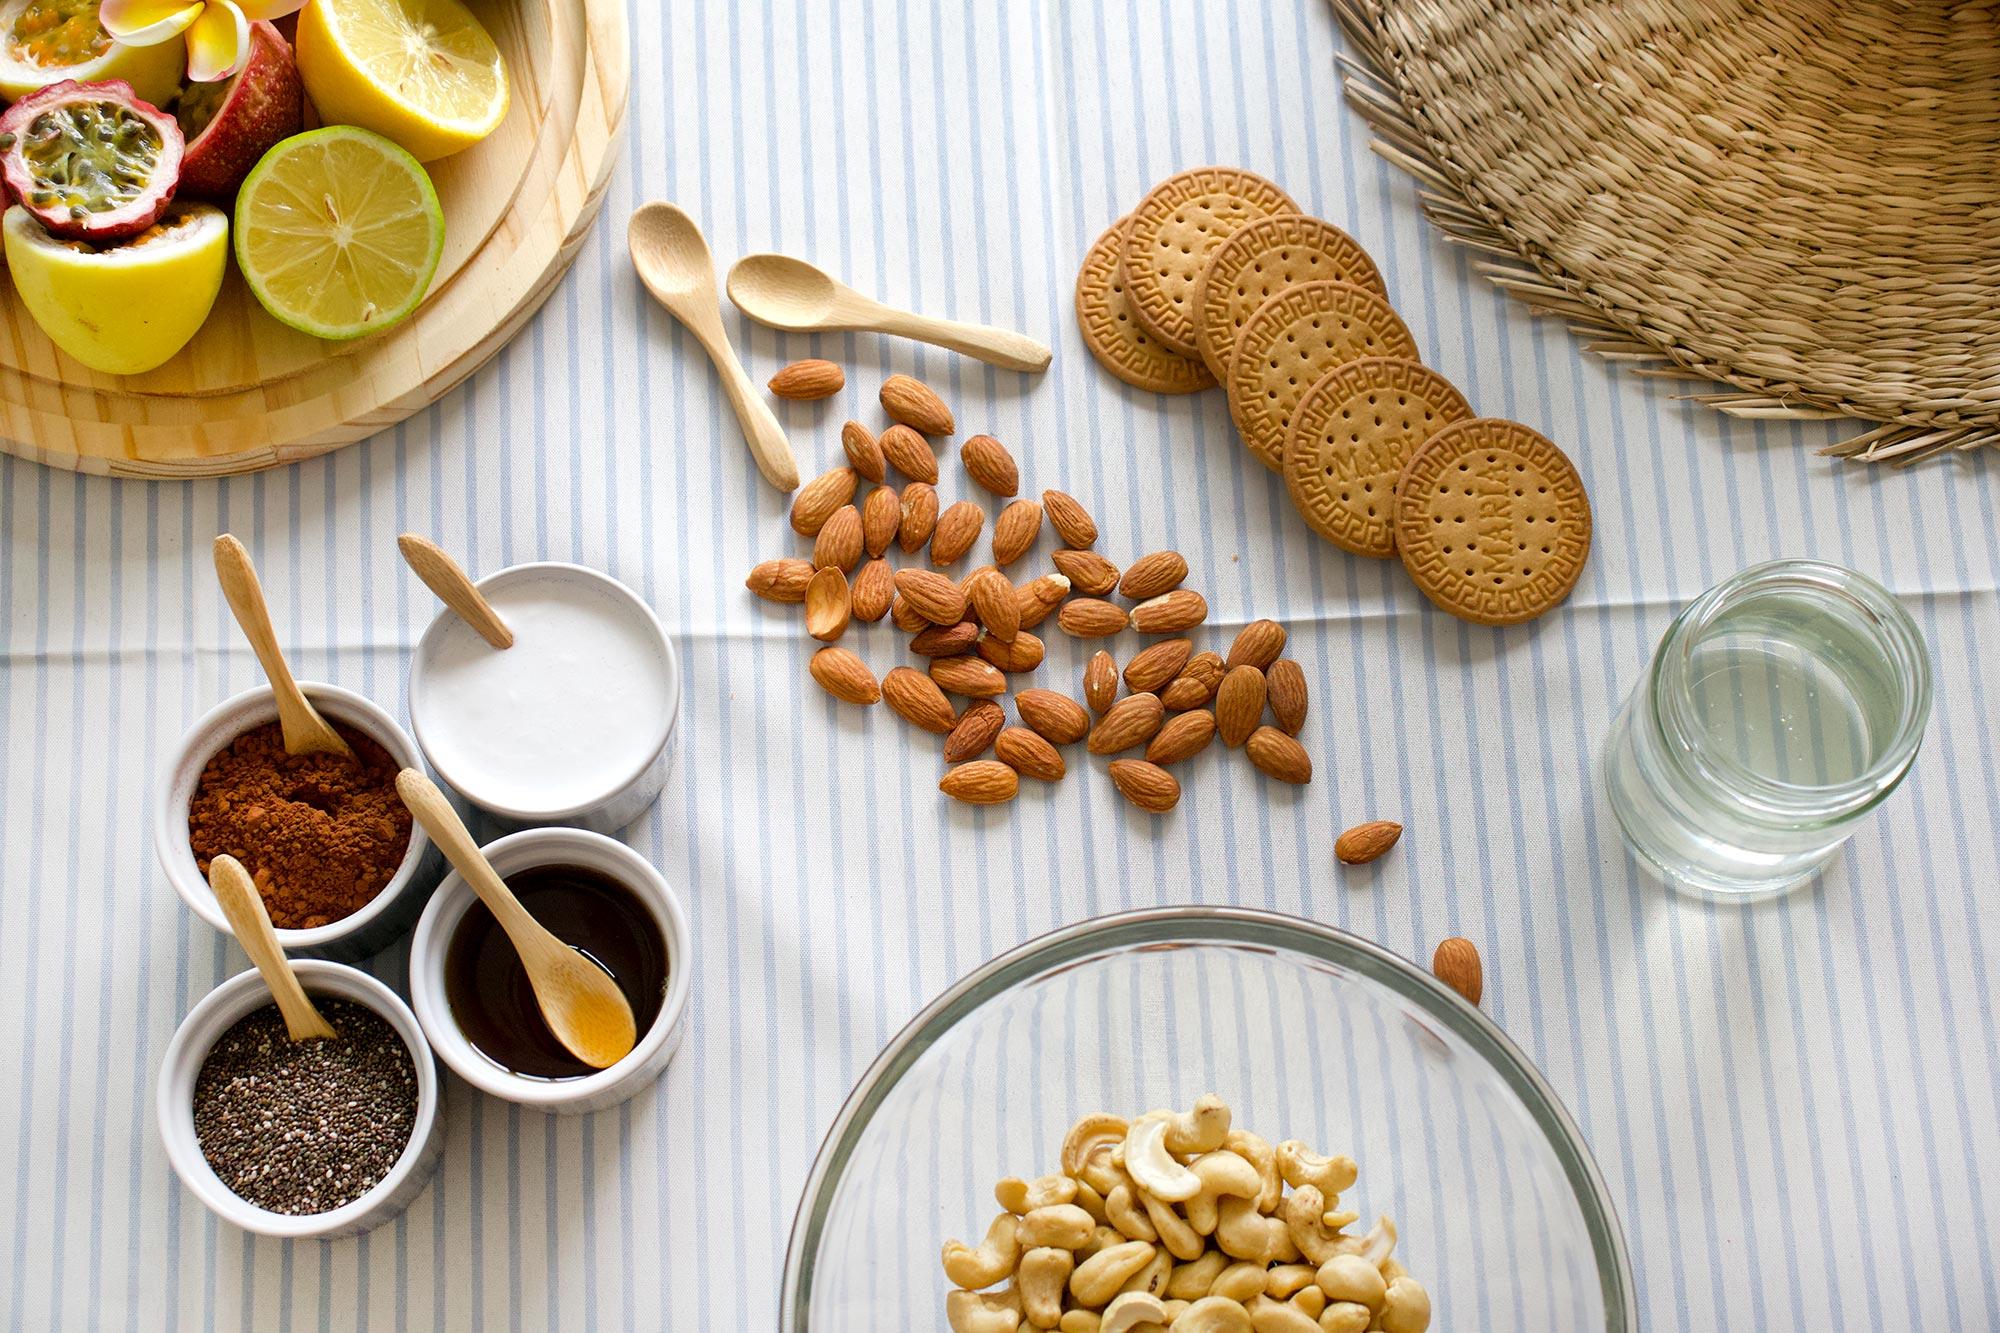 ingredientes-vegan-only-sweet.jpg